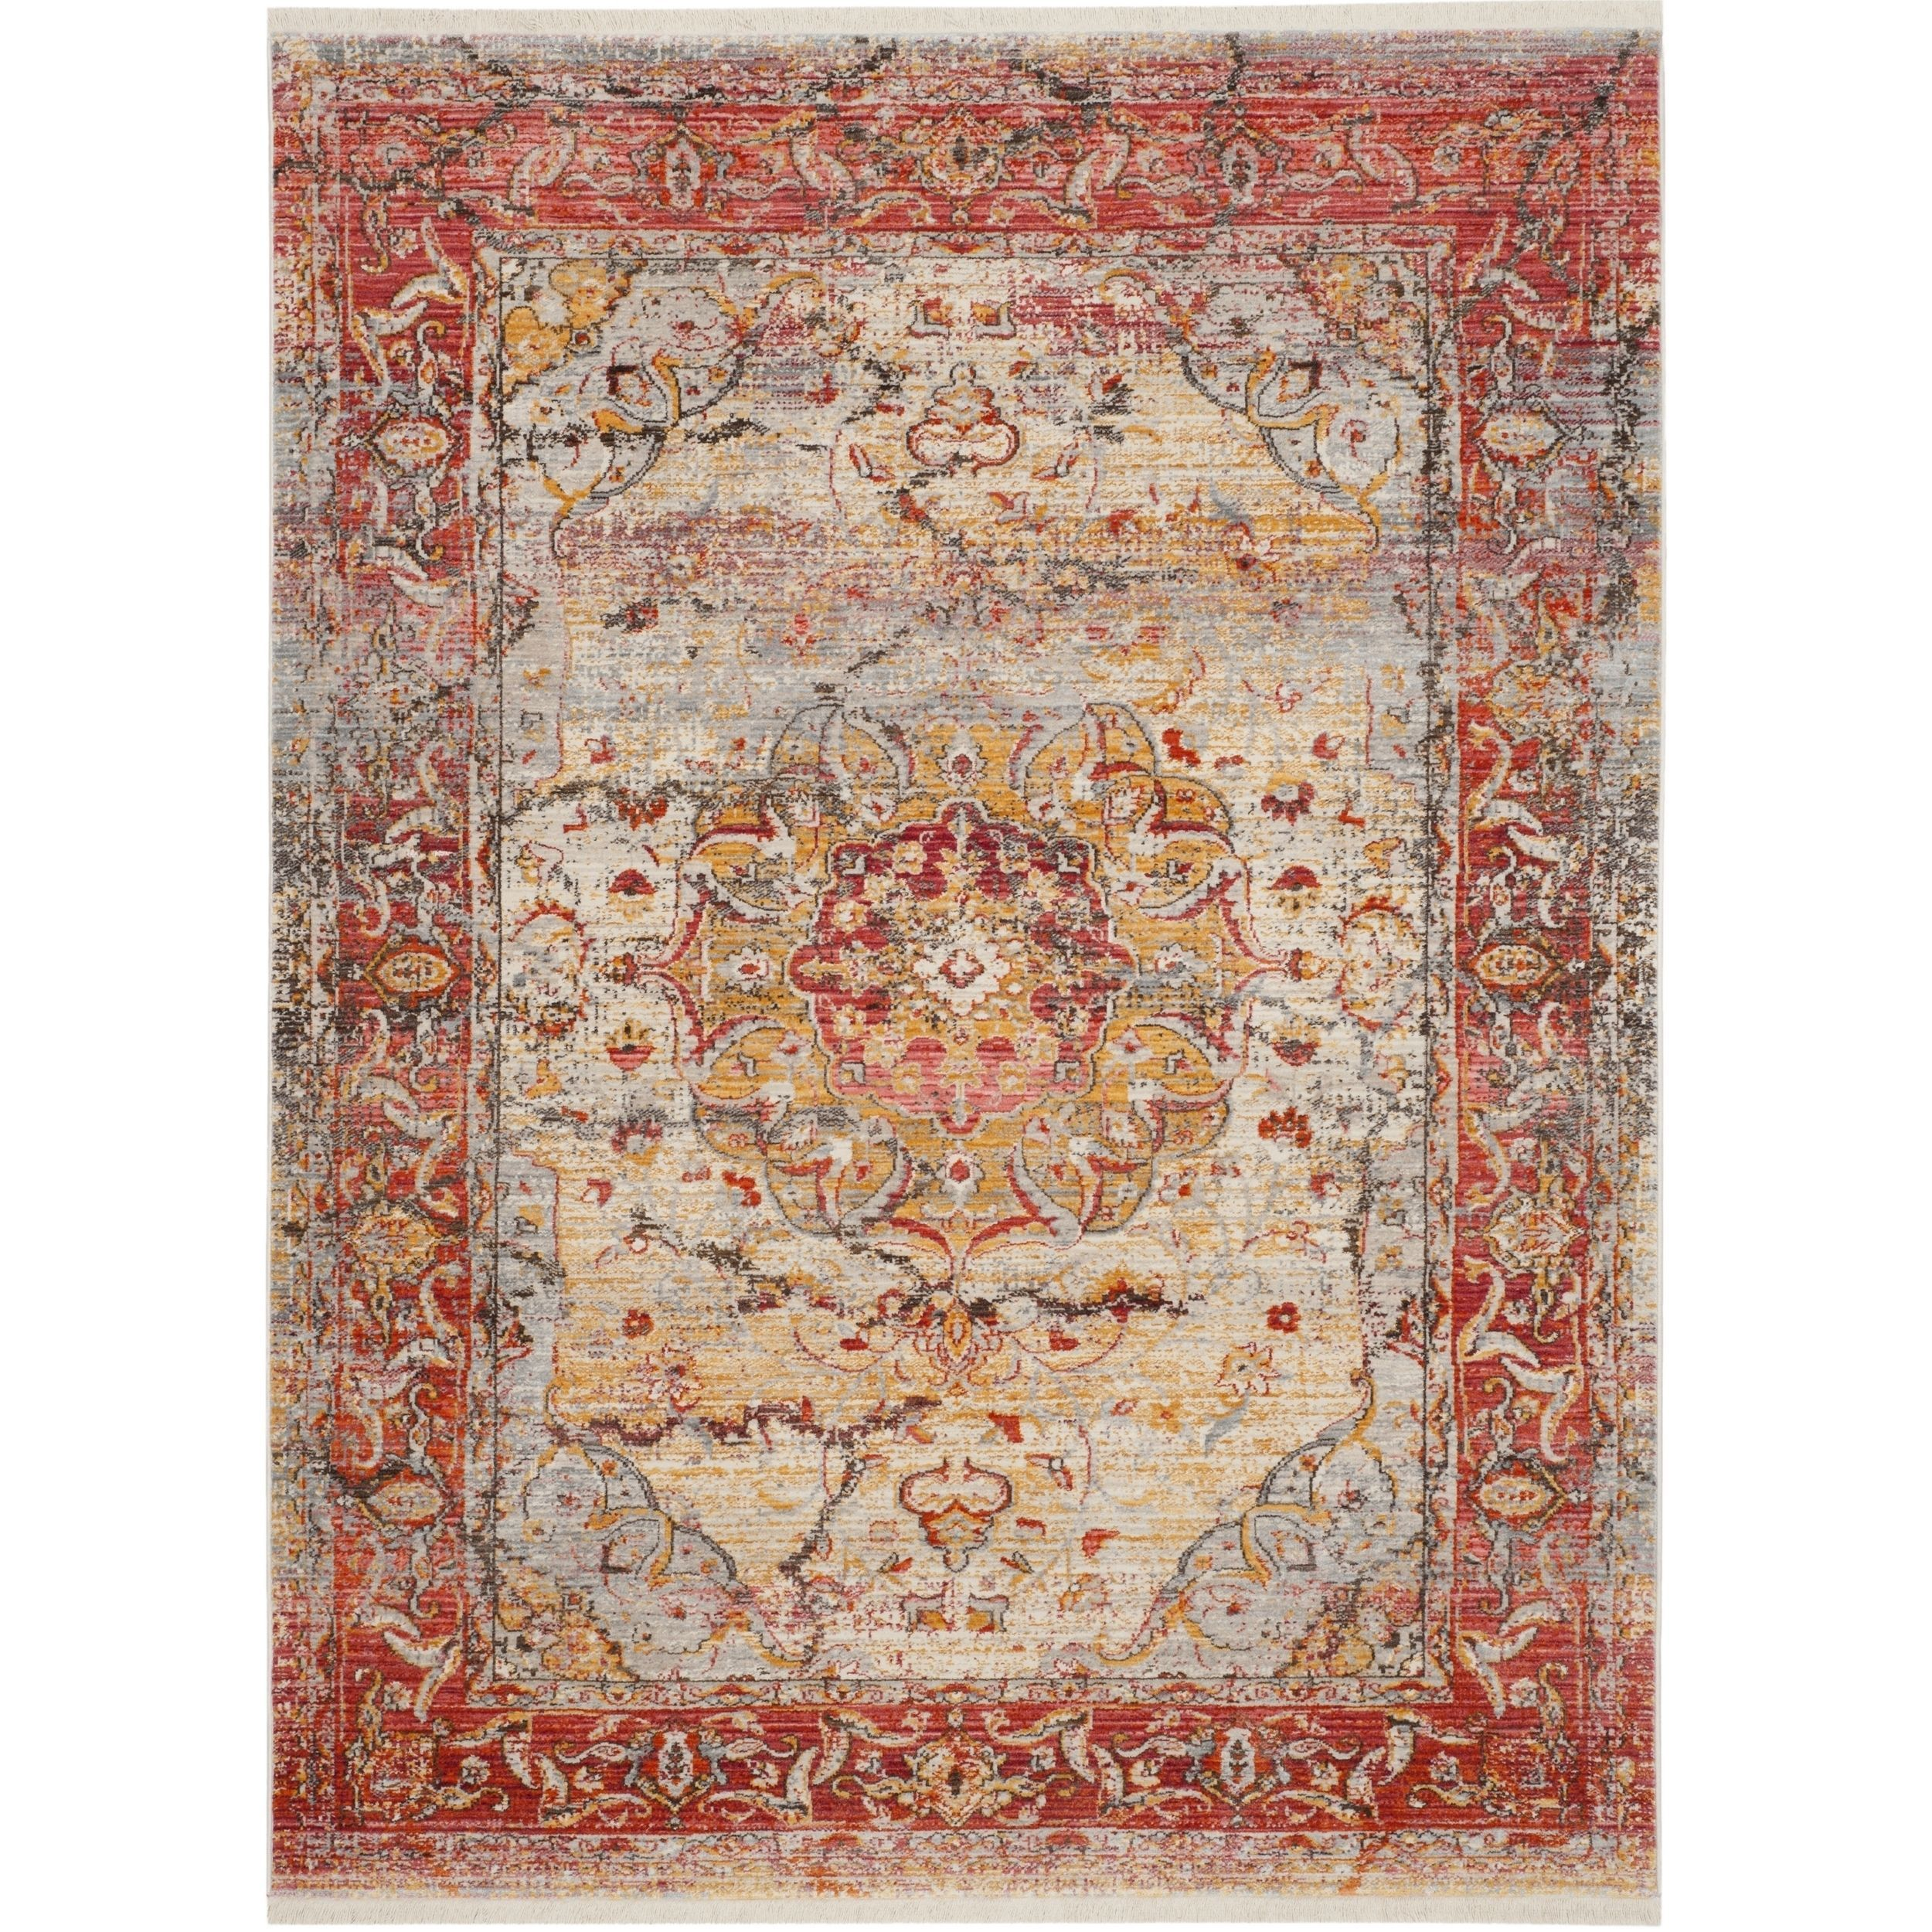 Safavieh Vintage Persian Pink/ Multi Polyester Rug (8u0027 x 10u0027) by Safavieh